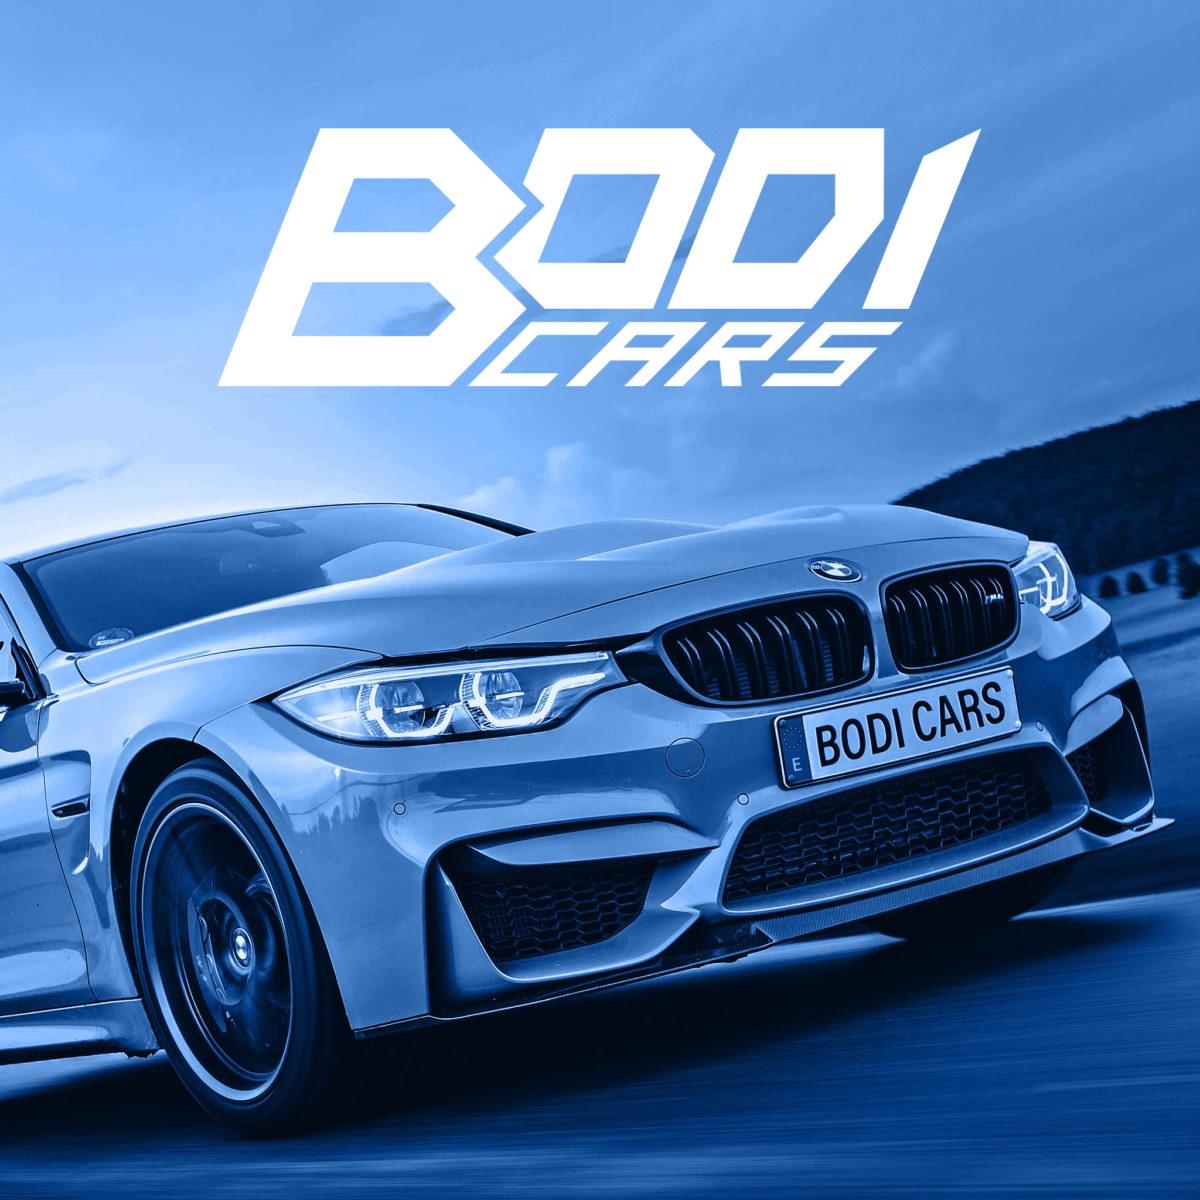 Foto Principal del Proyecto Branding Bodi Cars